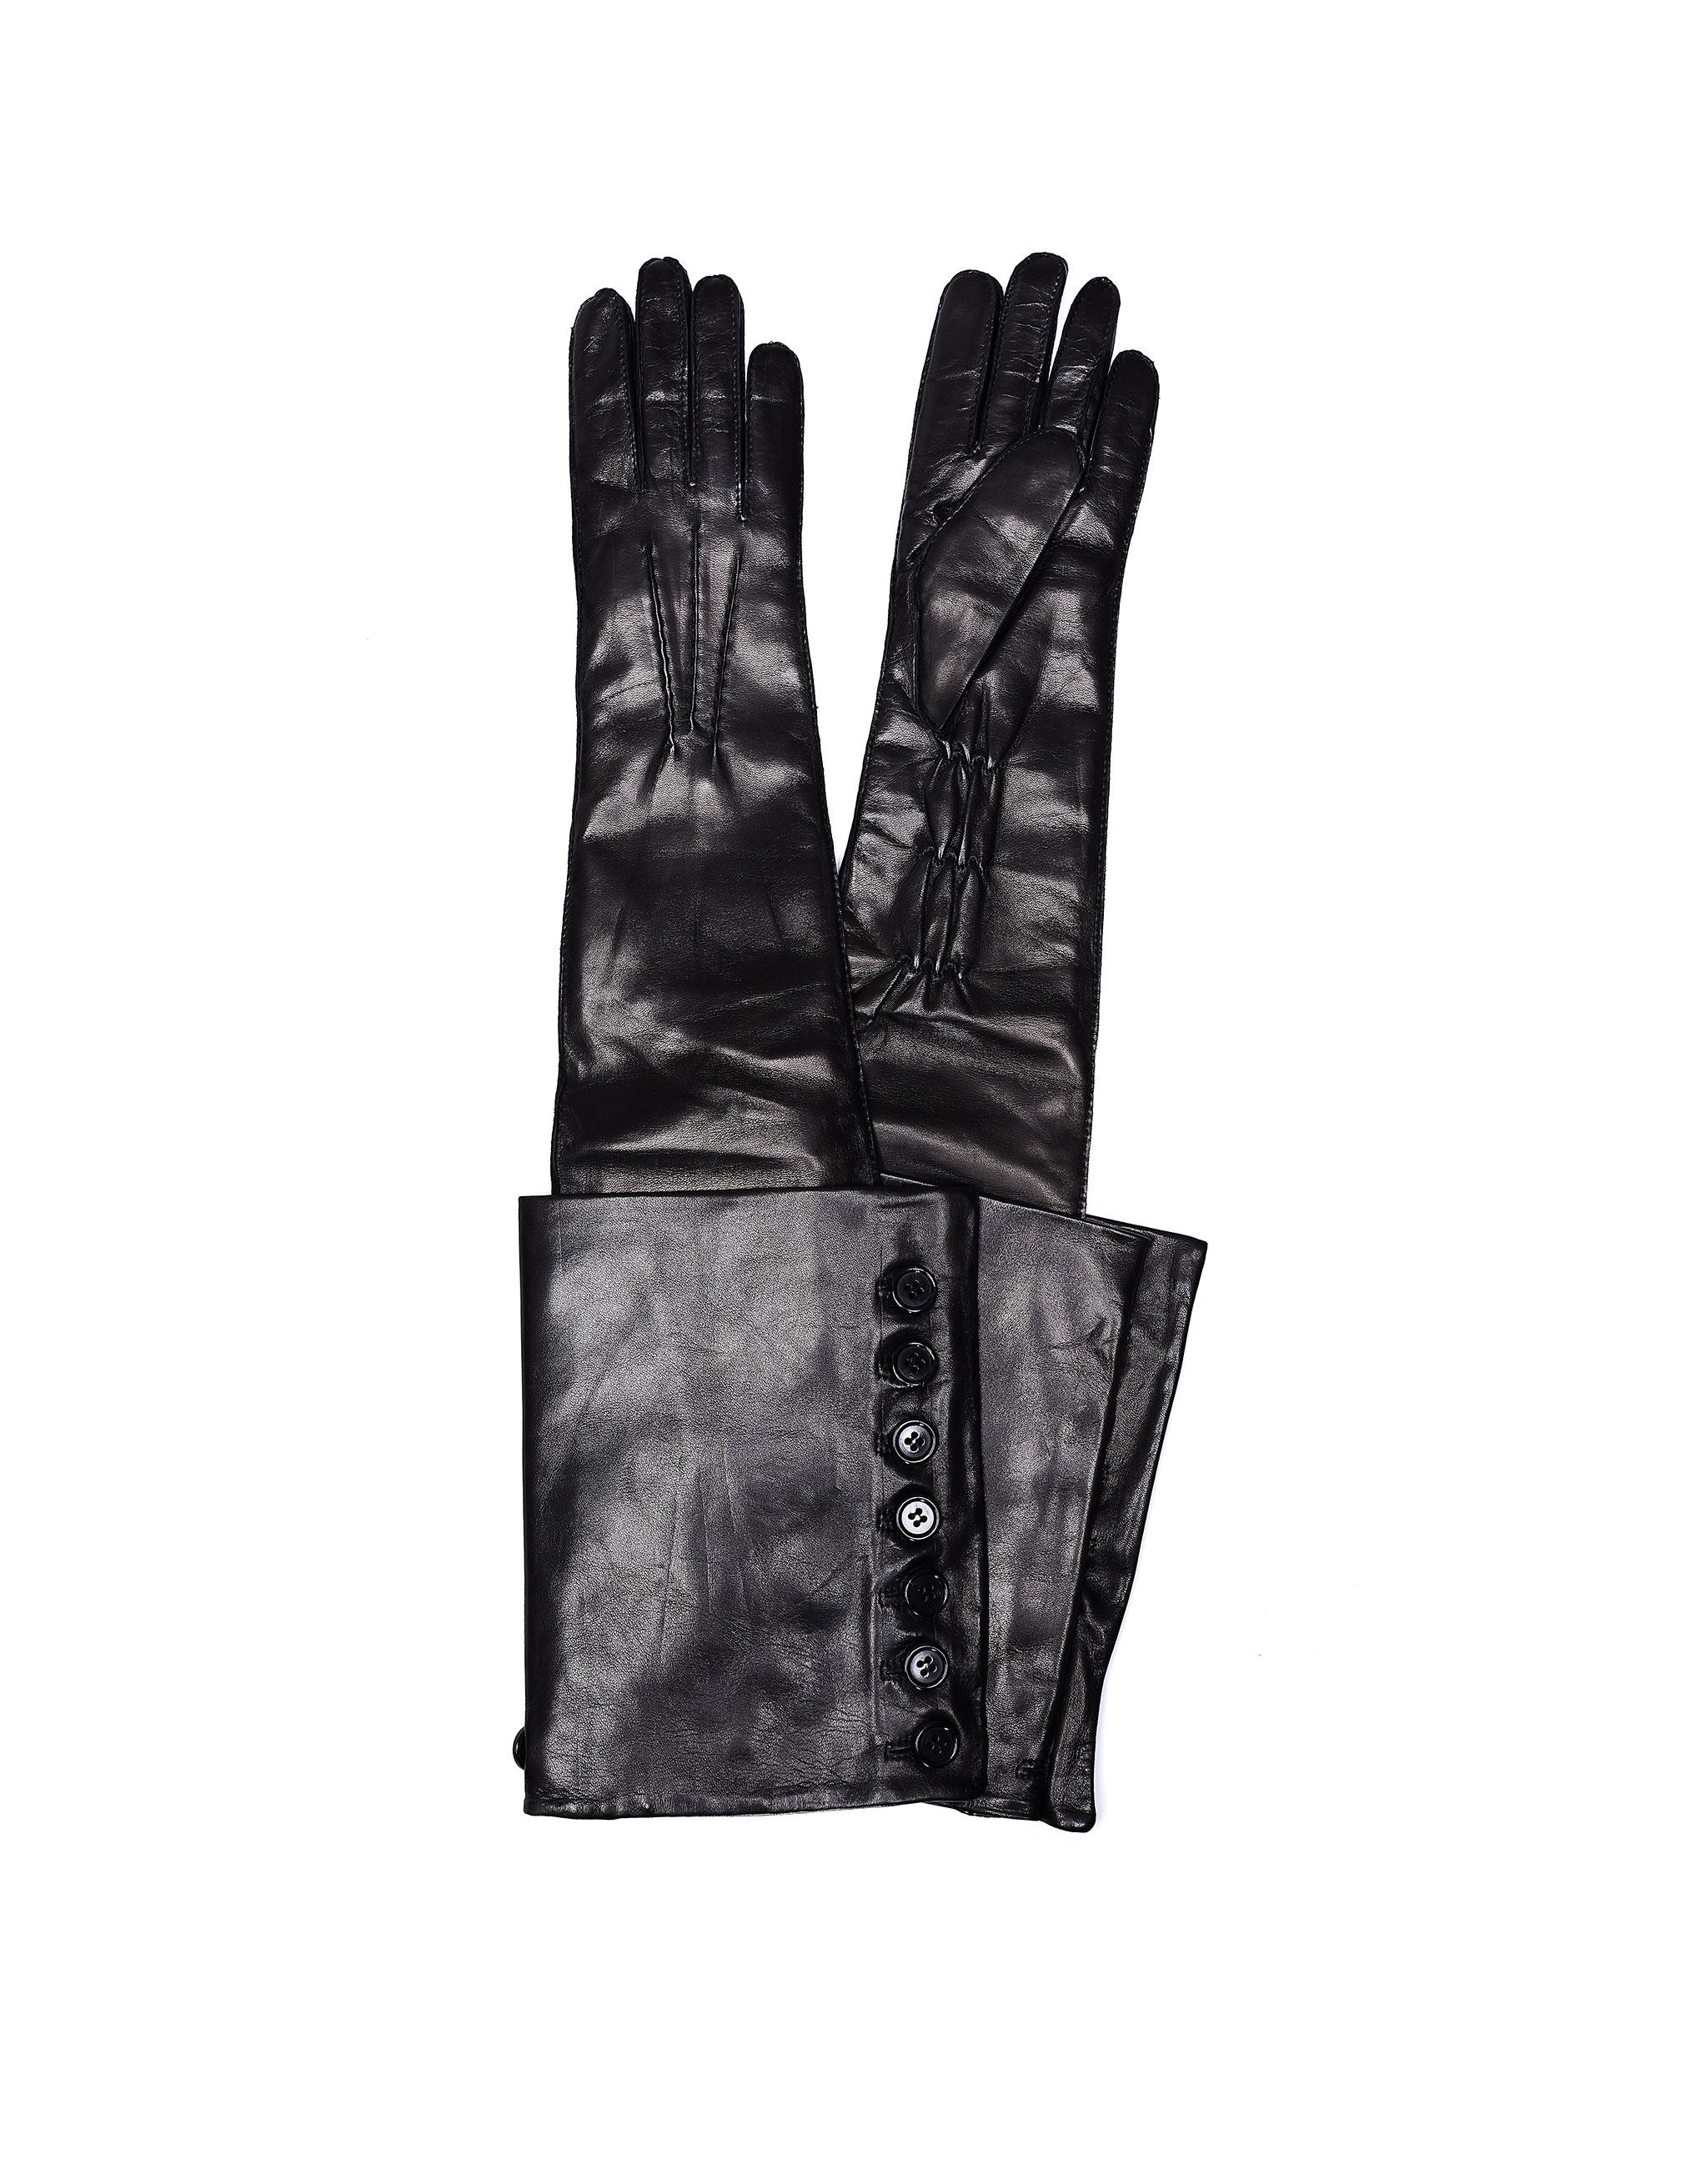 Ann Demeulemeester Joris Black Leather Gloves